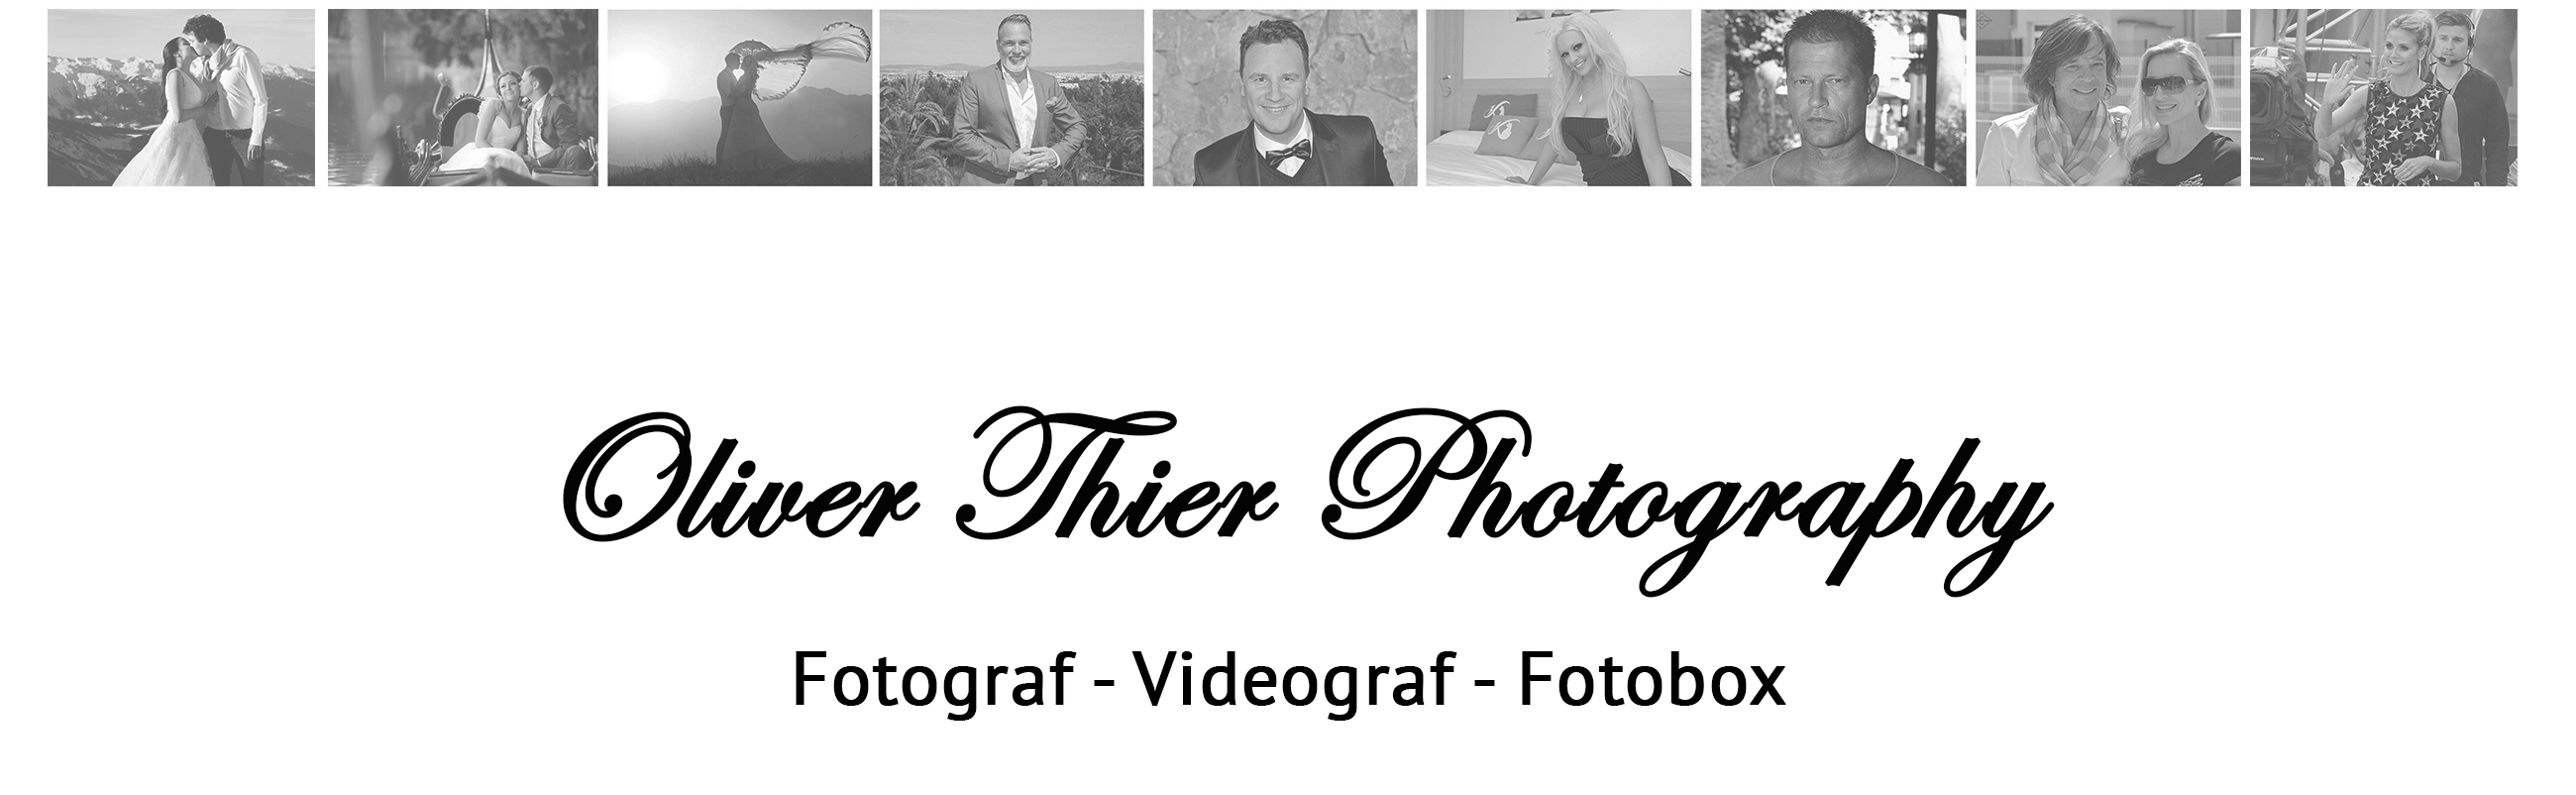 FOTOGRAF MIESBACH TEGERNSEE ROTTACH EGERN SCHLIERSEE HOCHZEITSFOTOGRAF